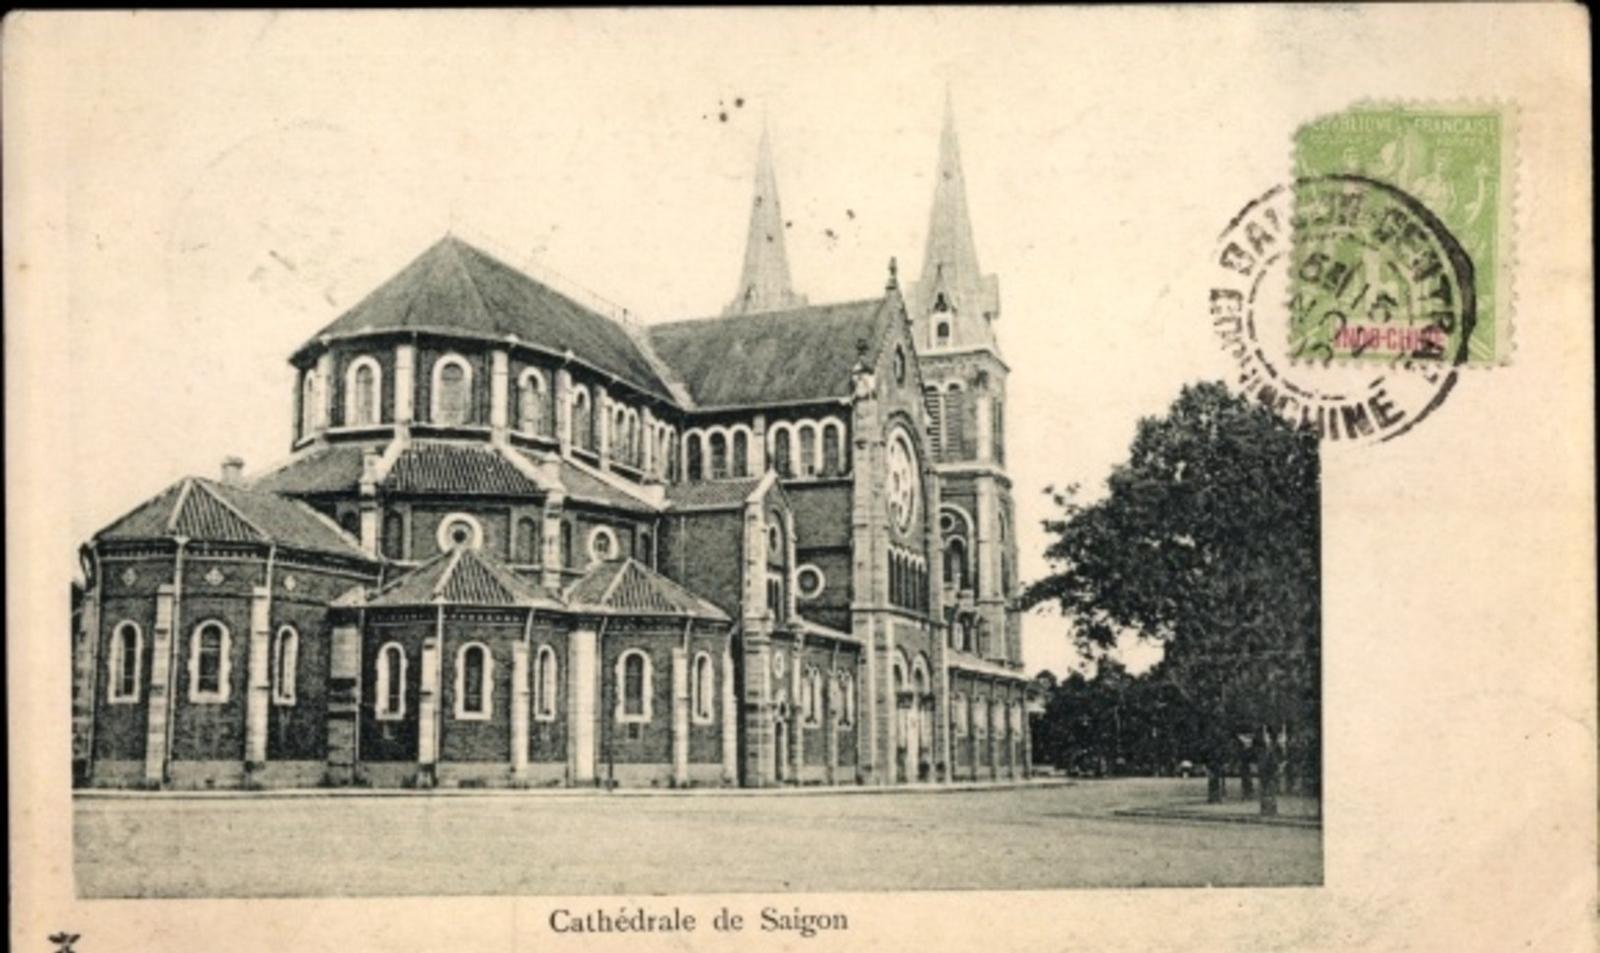 Hô Chi Minh-Ville -  Cp Saigon Cochinchine Vietnam, Cathédrale de Saigon